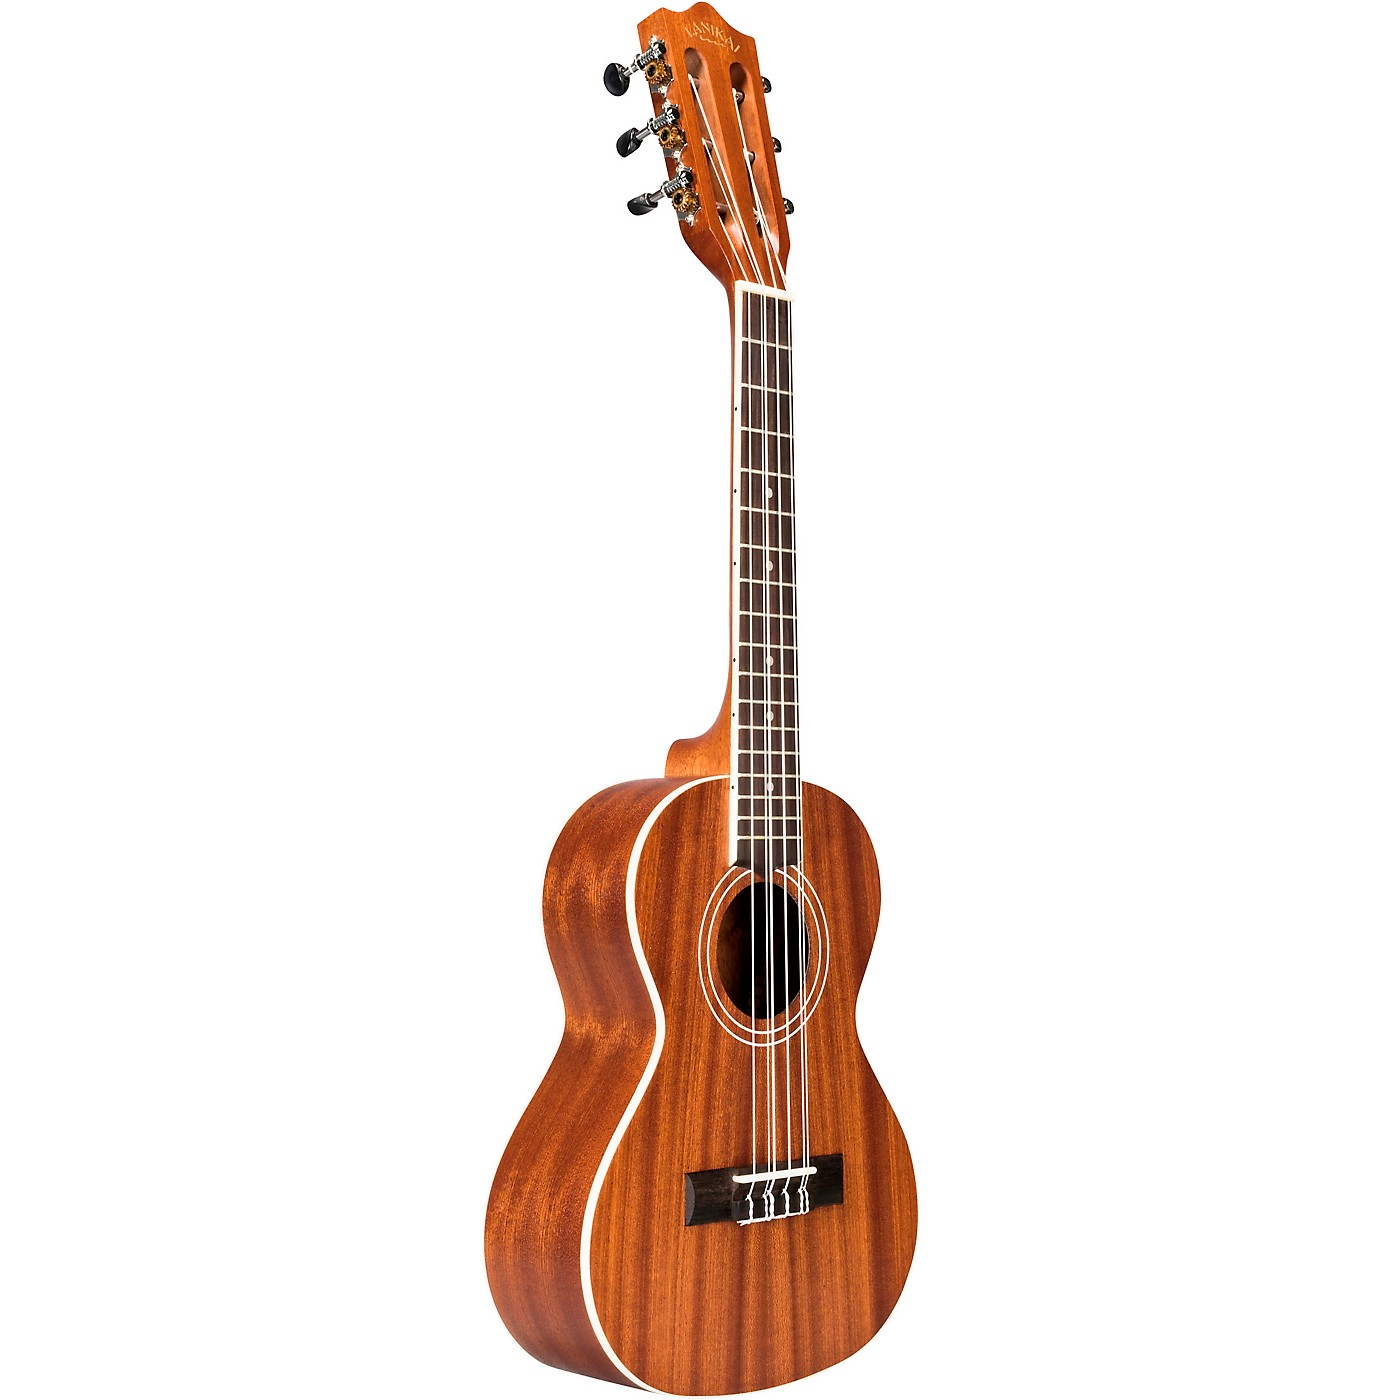 Lanikai MA-6T Mahogany 6-String Tenor Ukulele thumbnail